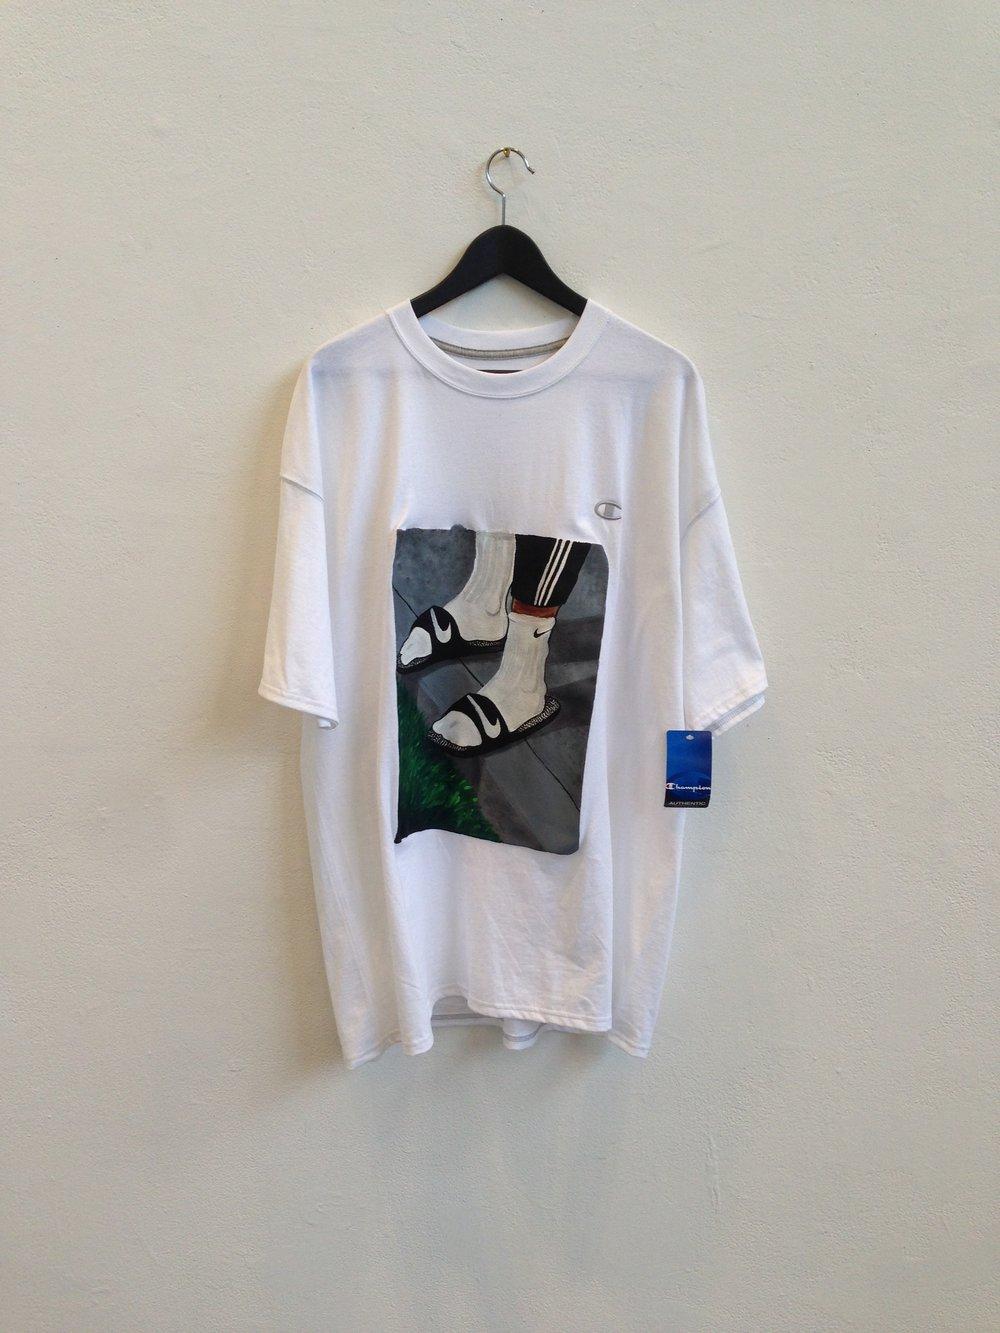 The Precipice T  acrylic on Champion t-shirt  size XL  2014